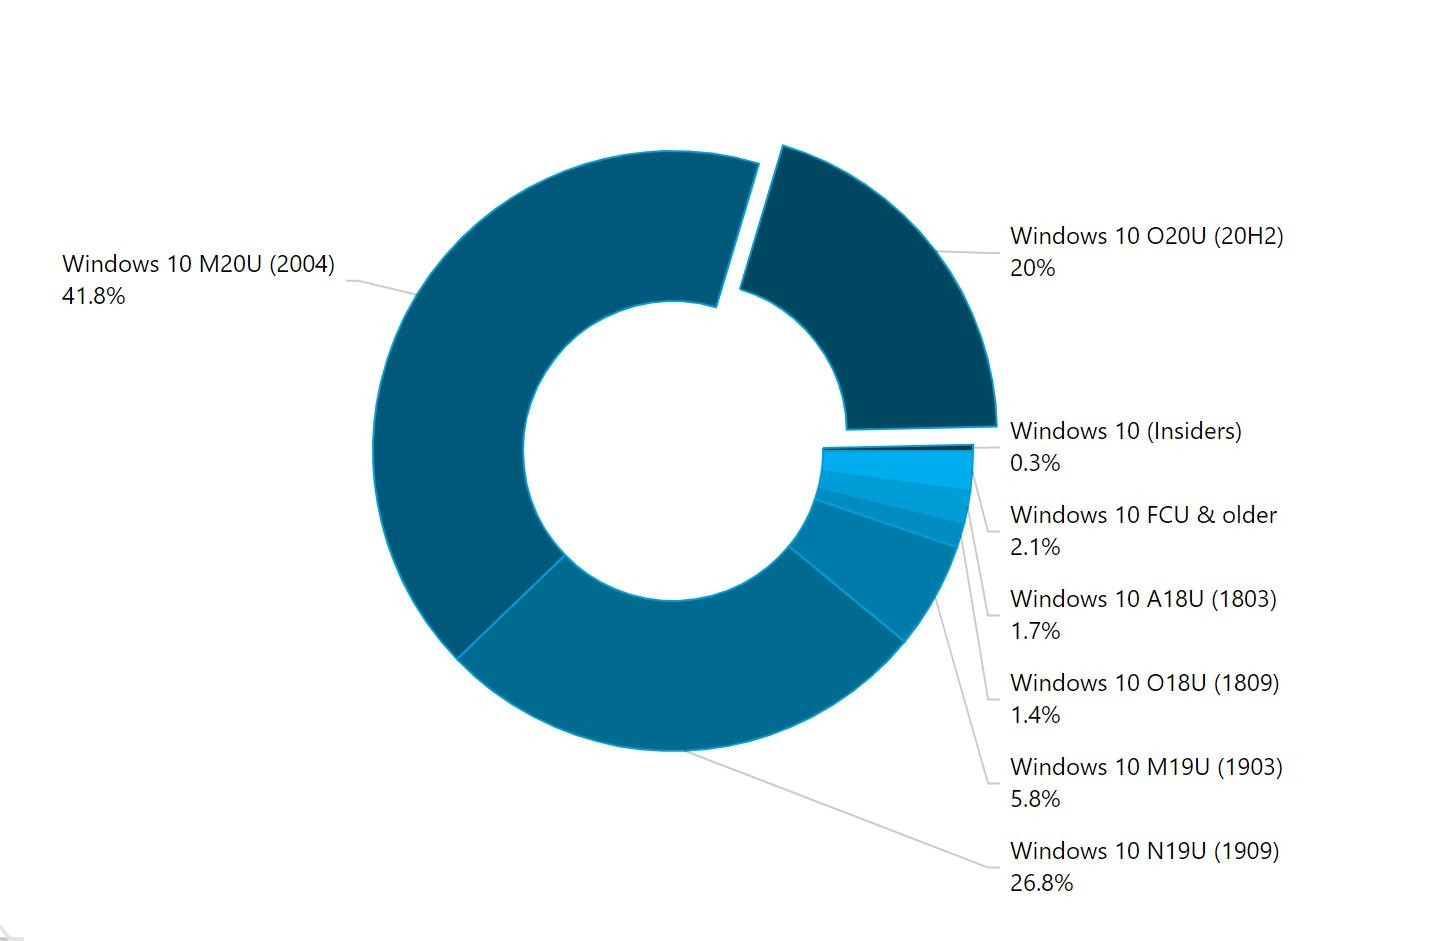 version 20h2 now running on 1 in 5 windows 10 pcs